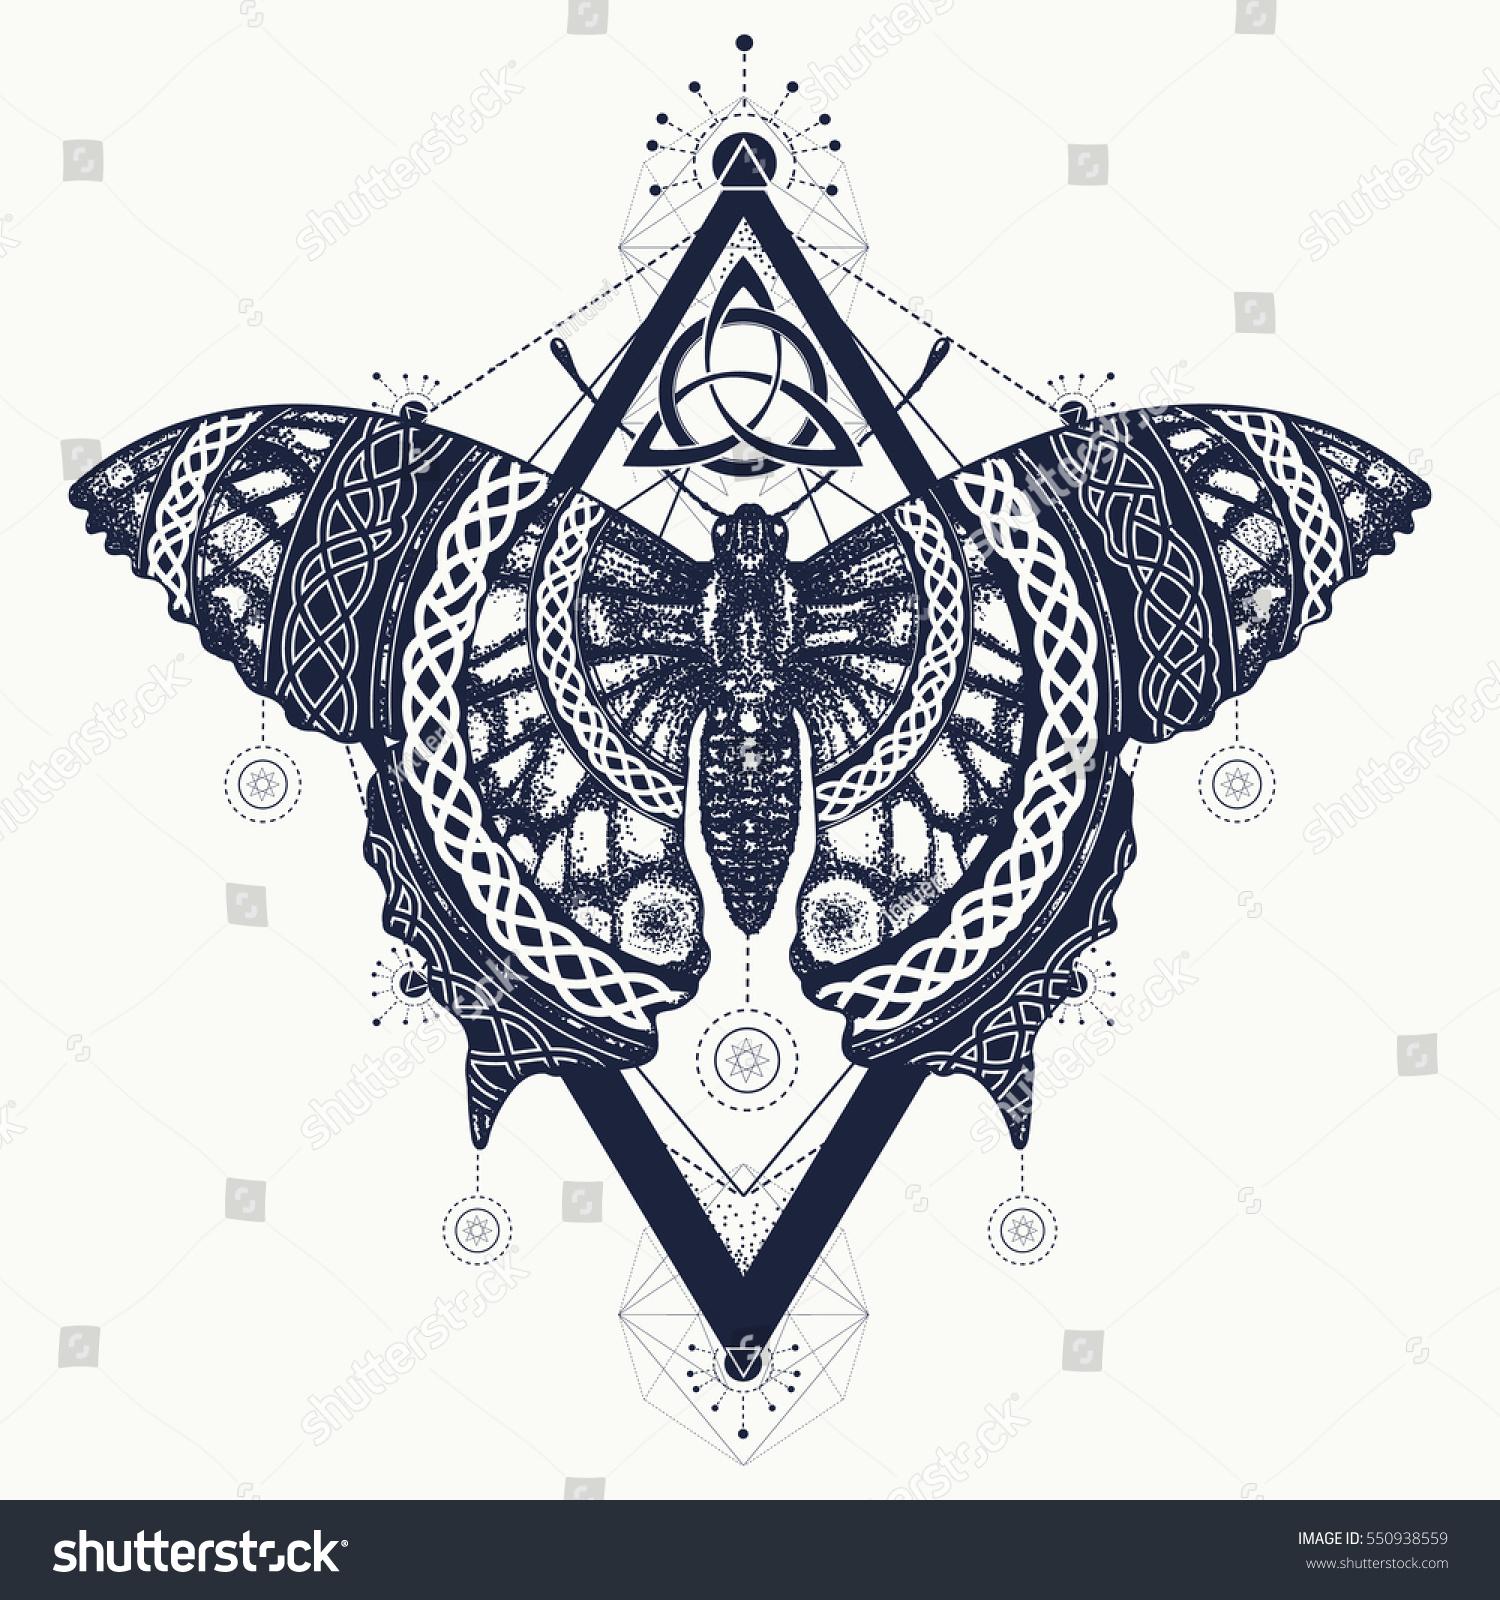 2343622a1 Mystical symbol of freedom, nature, tourism. Beautiful Swallowtail boho t-shirt  design